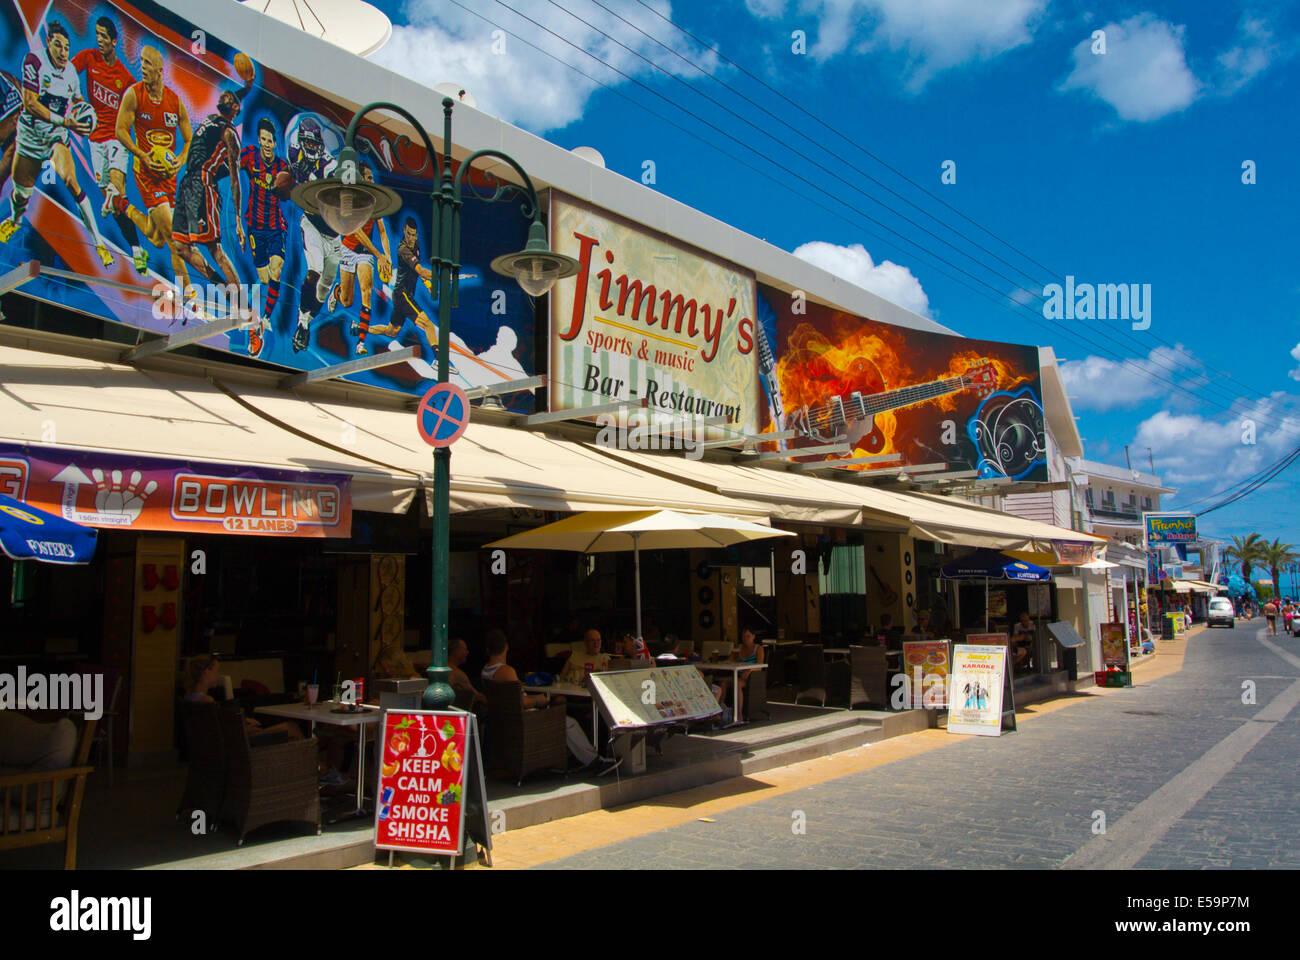 Main street with bars and cafes, Faliraki resort, Rhodes island, Dodecanese islands, Greece, Europe - Stock Image